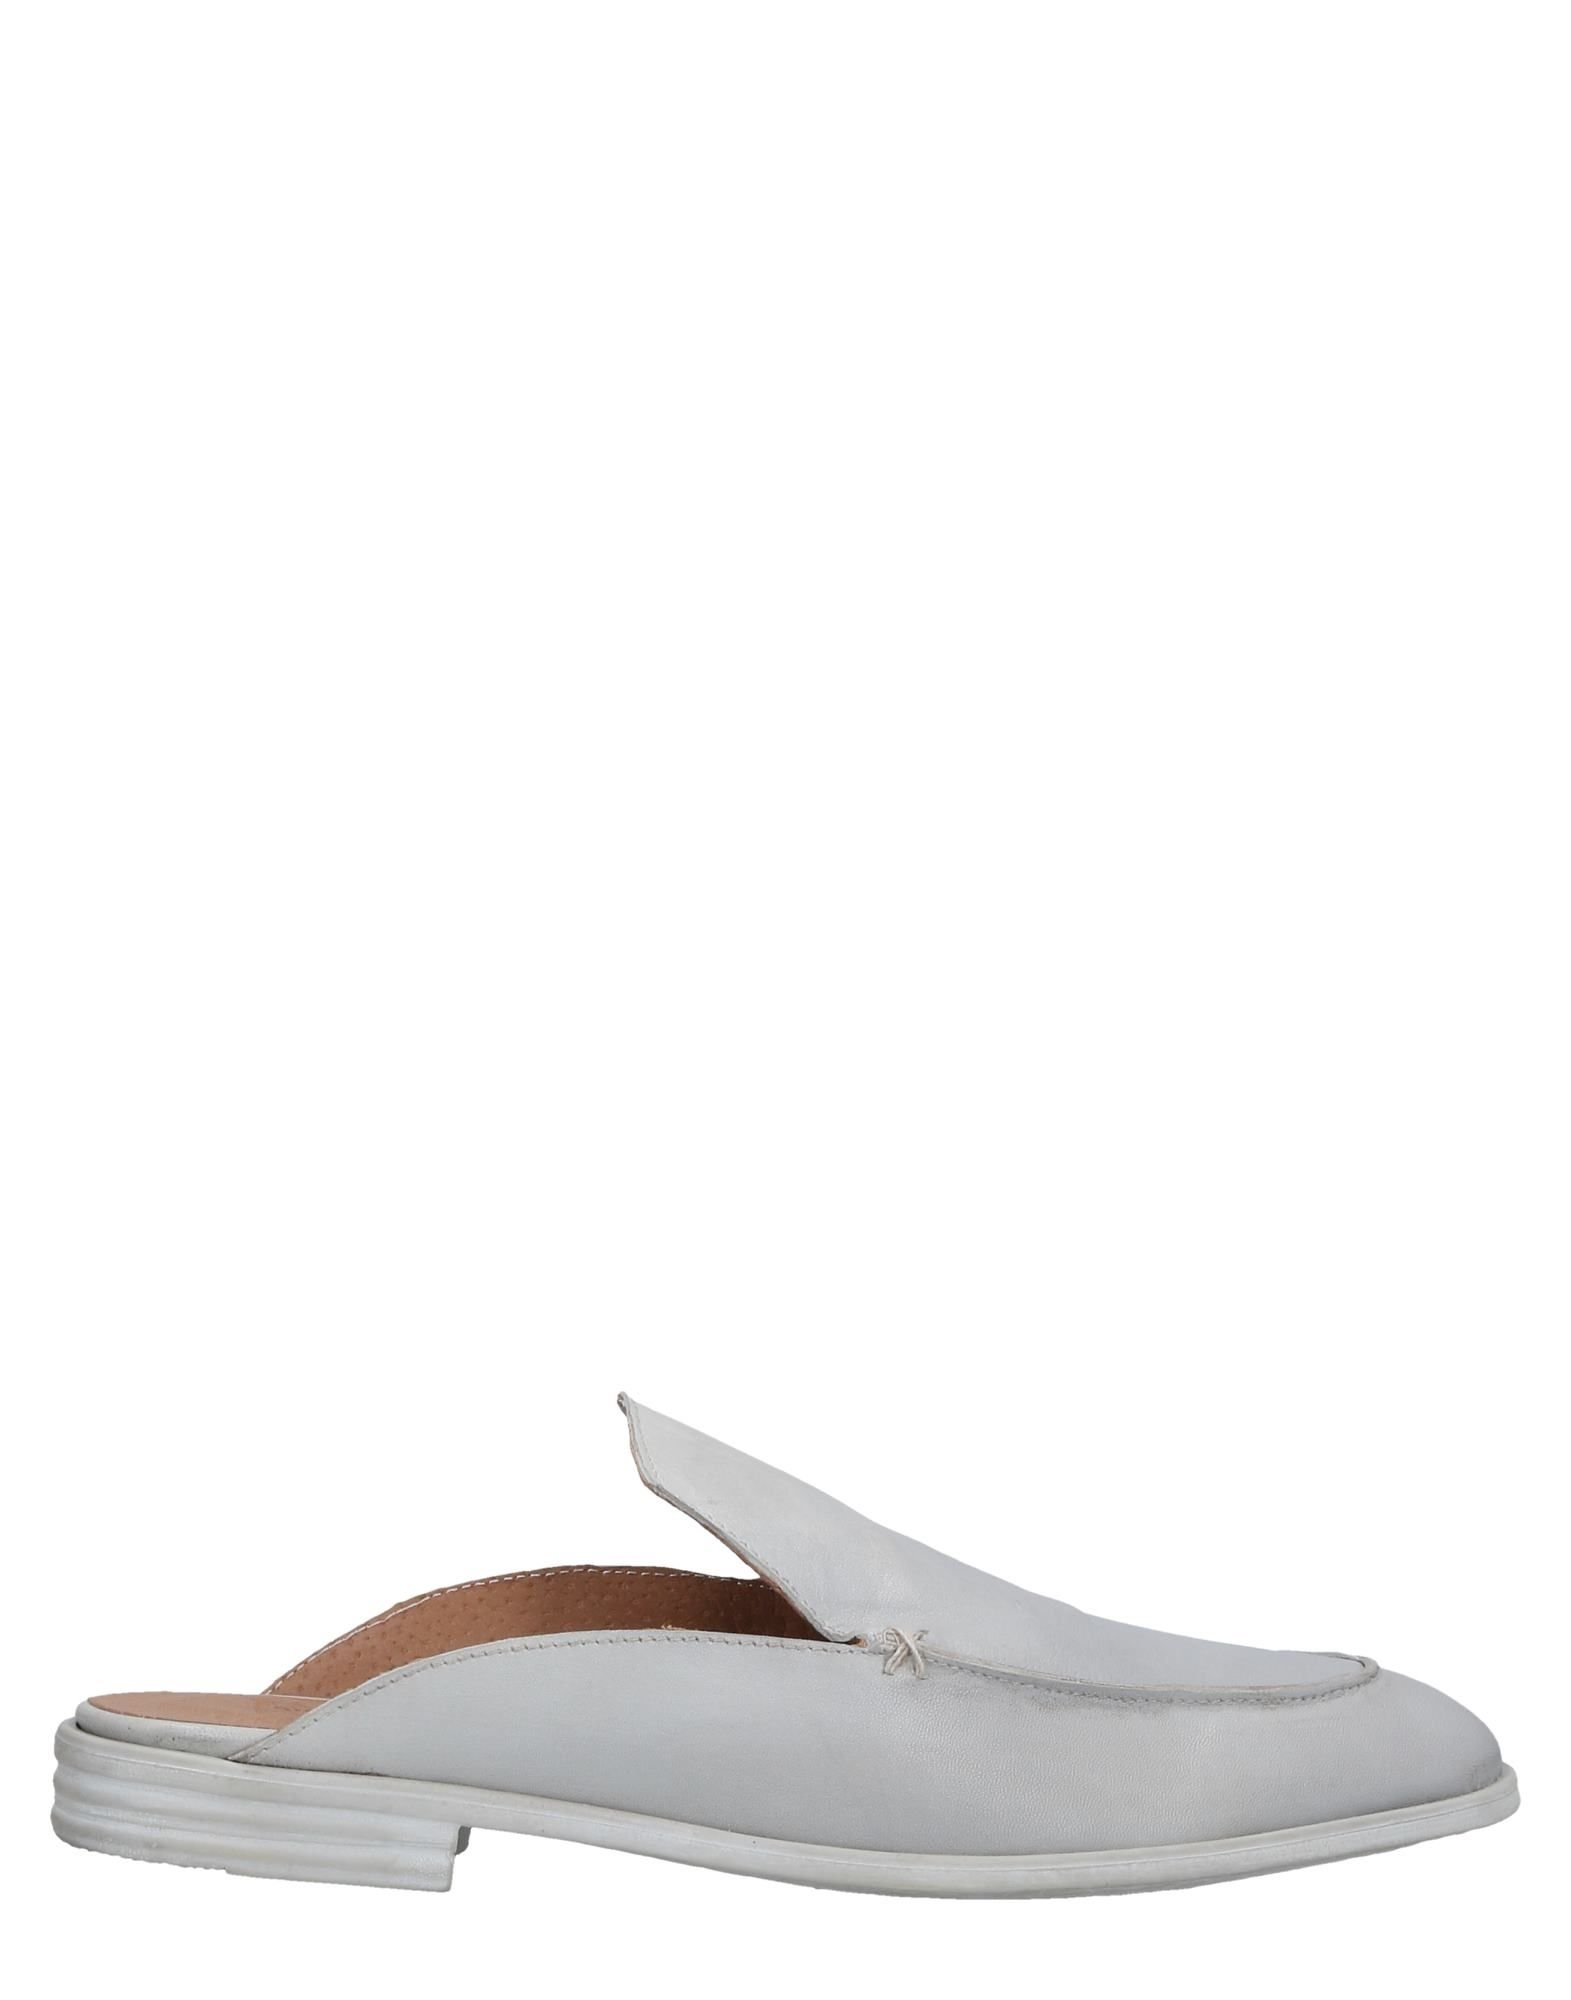 Divine Follie Pantoletten Damen  11512005JX Gute Qualität beliebte Schuhe